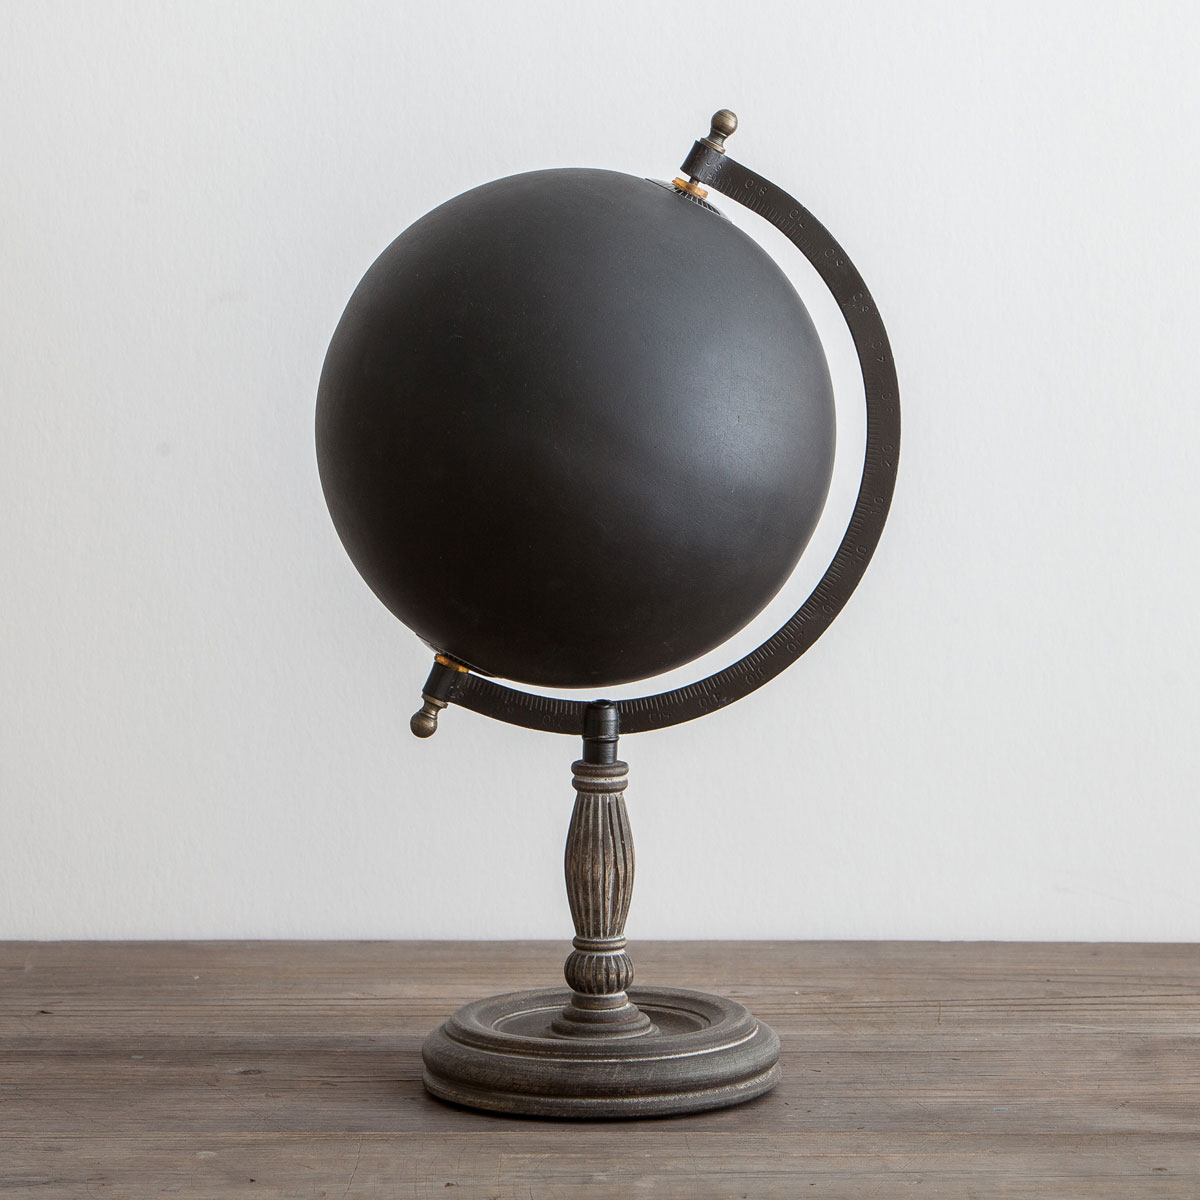 The Lord Is Good - Chalkboard Globe